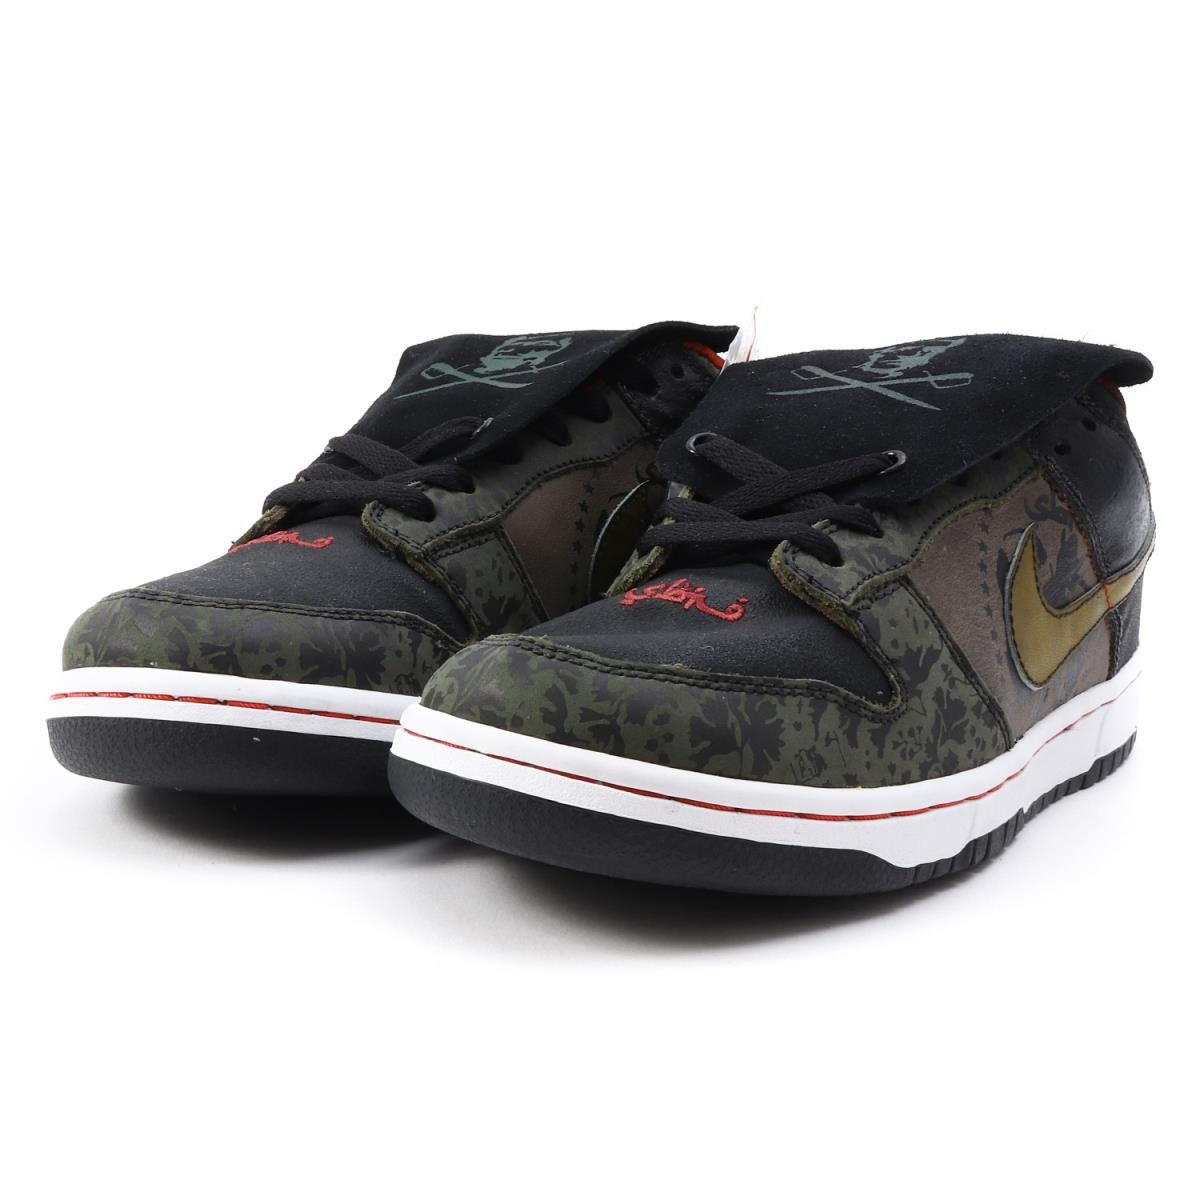 super popular 44a09 be932 NIKE (Nike) DUNK LOW PREMIUM SB SBTG (313,170-201) sable coat green X  metallic gold US9.5(27.5cm)